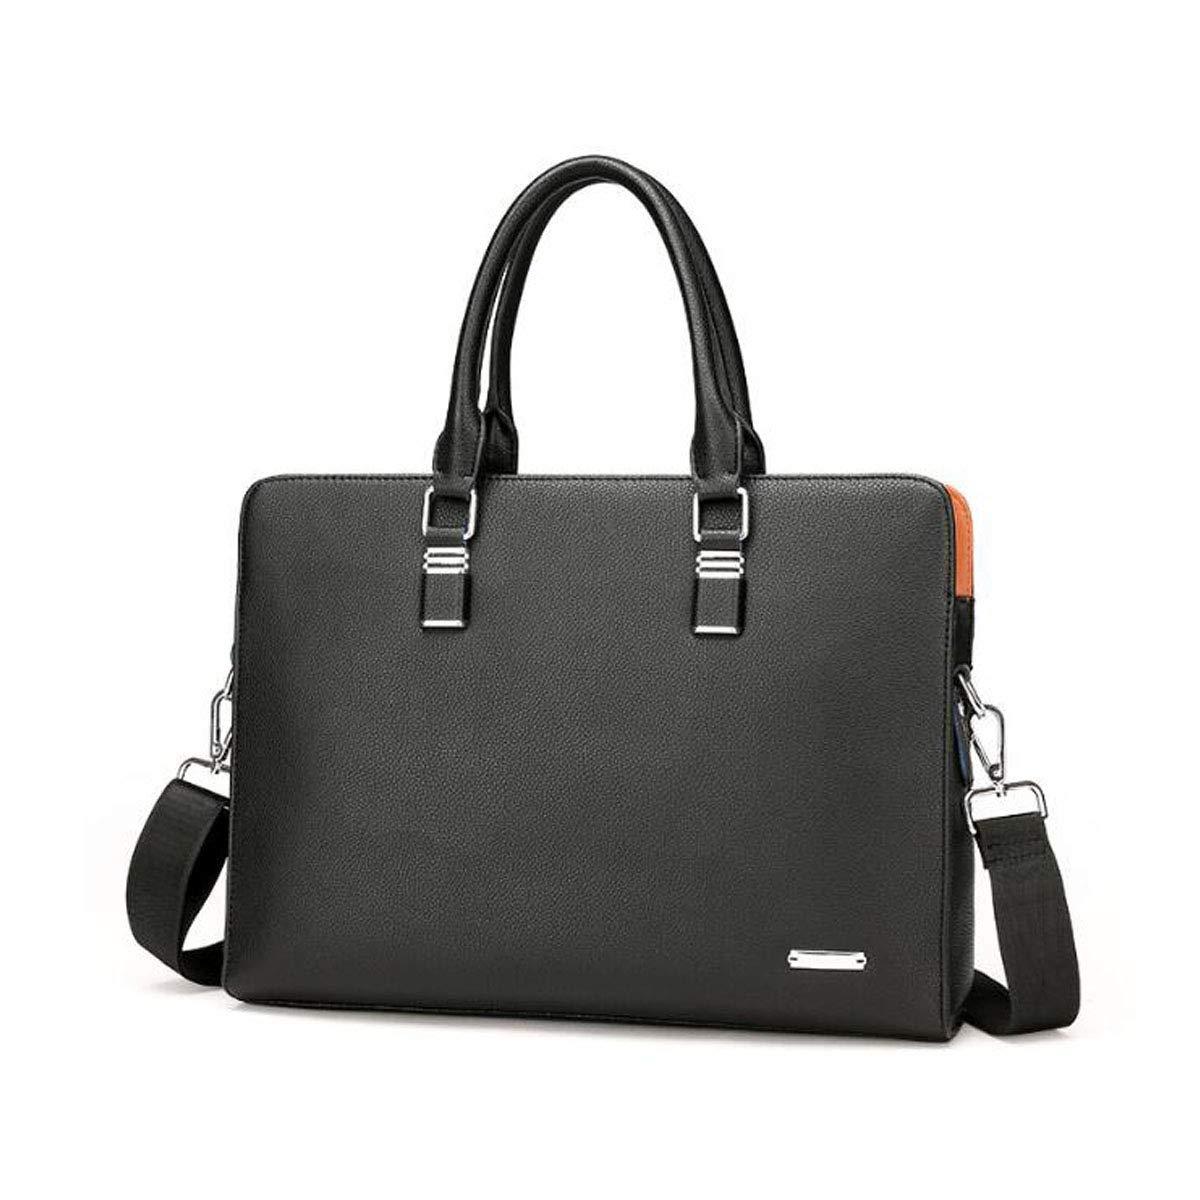 Hengxiang メッセンジャーバッグ、ラップトップブリーフケース、弁護士バッグ、大容量ラップトップバッグ、ビジネスメンズスリムバッグ、サイズ:38827cm ビジネスオフィスメッセンジャーバッグ(色:ブラック)   B07PCQGNNP